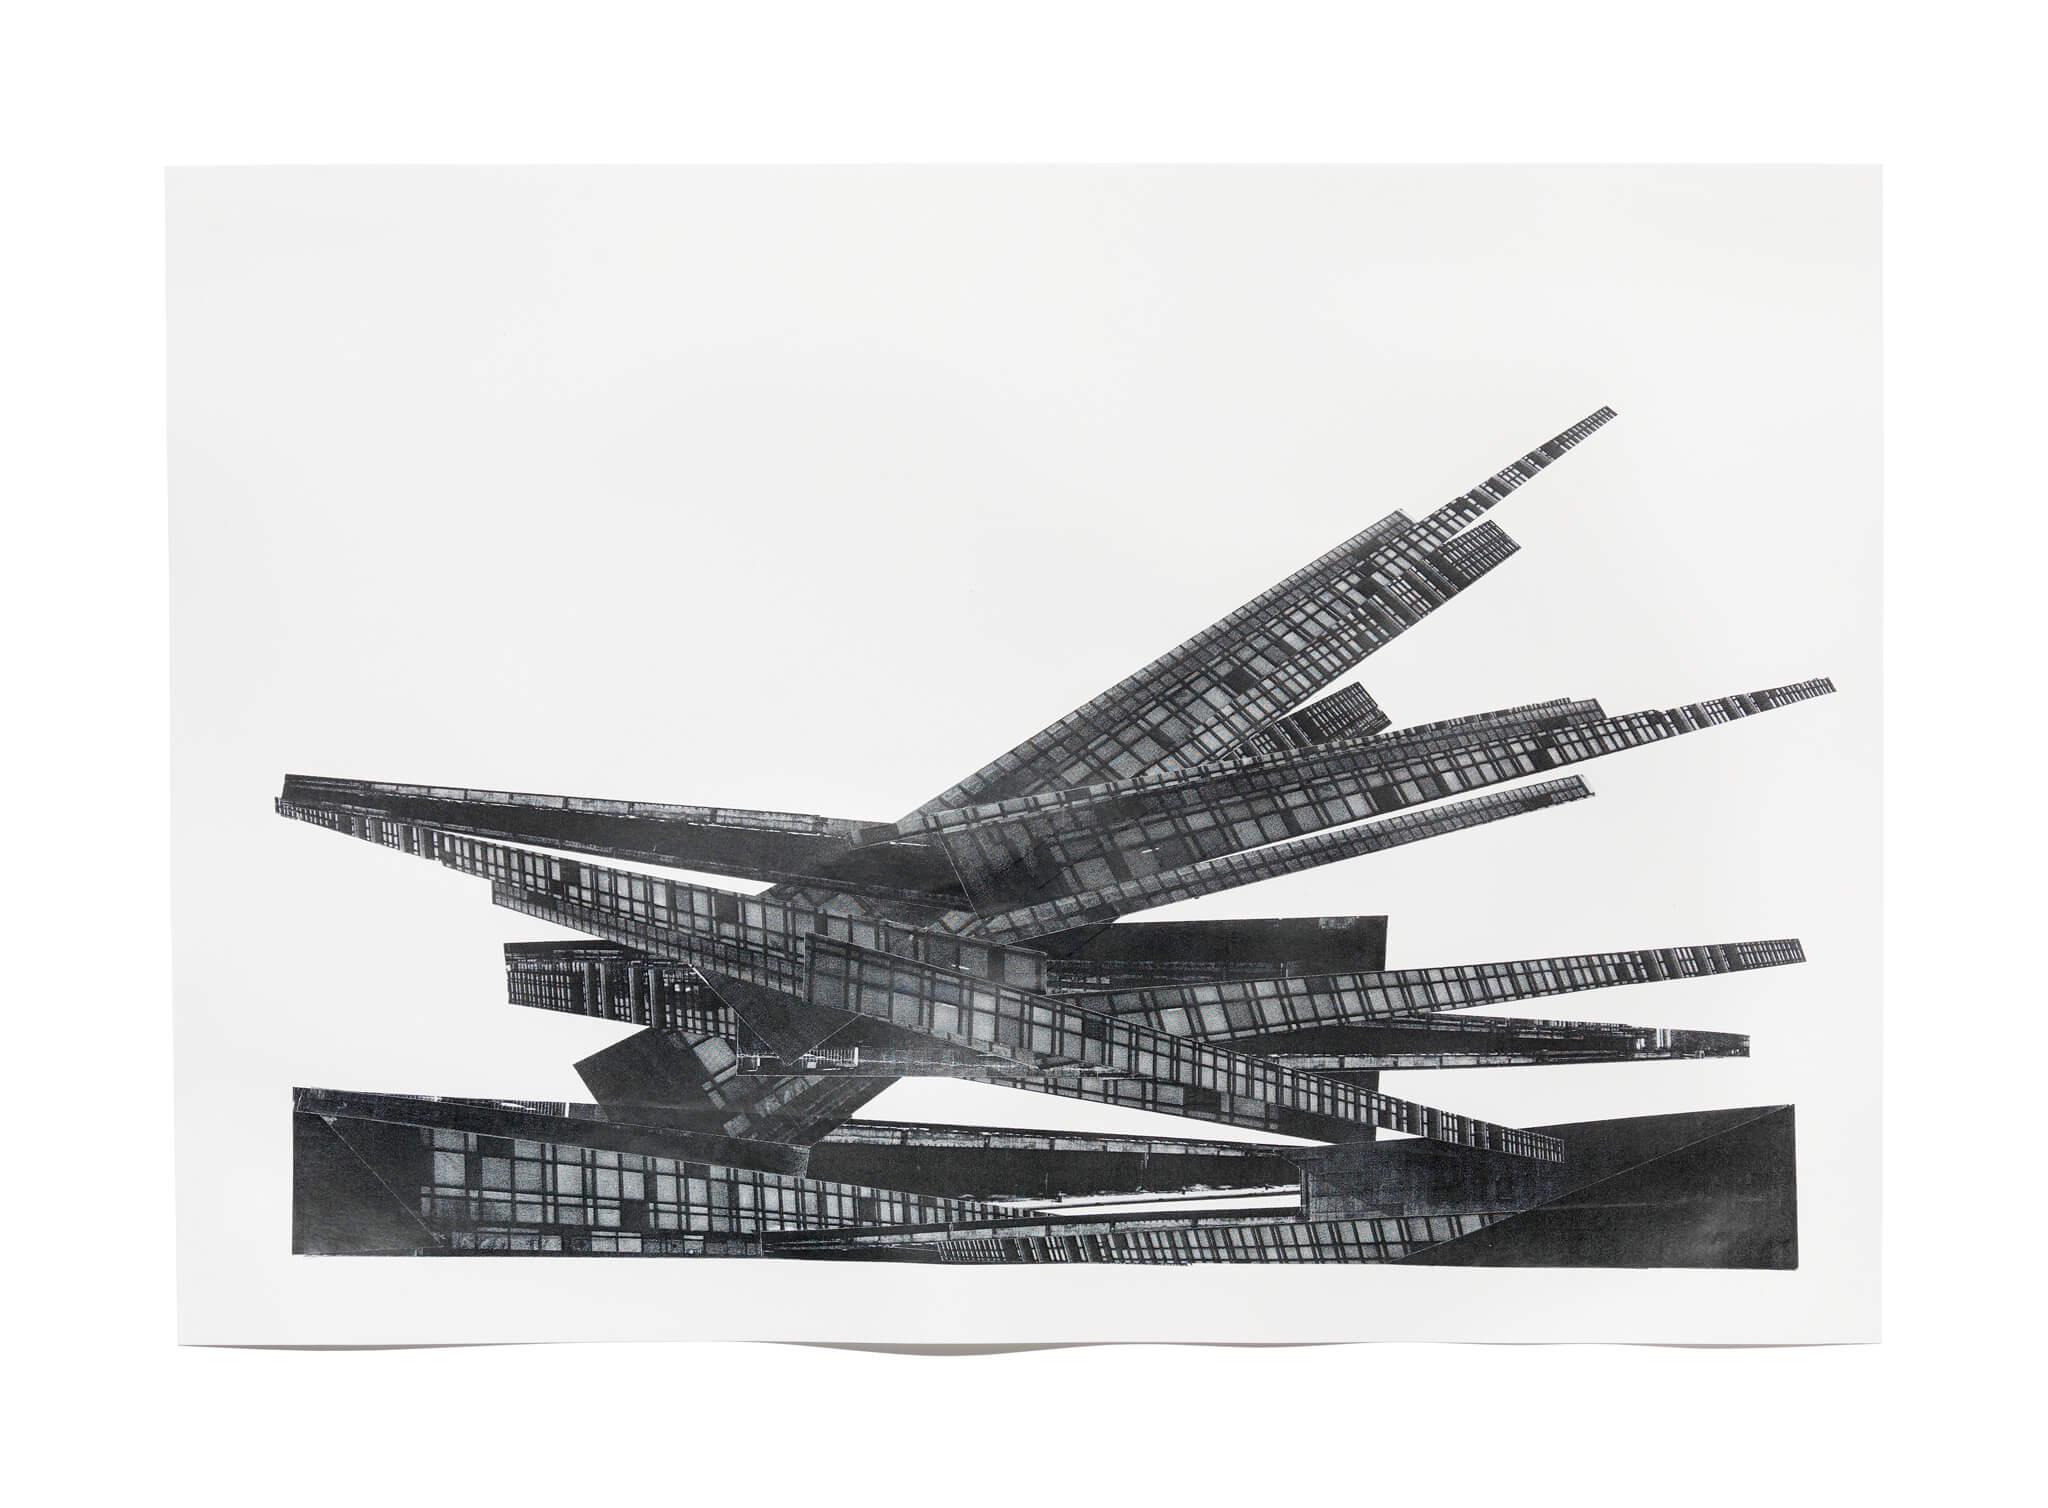 14_Frauke-Dannert_Collage_Papiercollage_-Palast-2_-2011